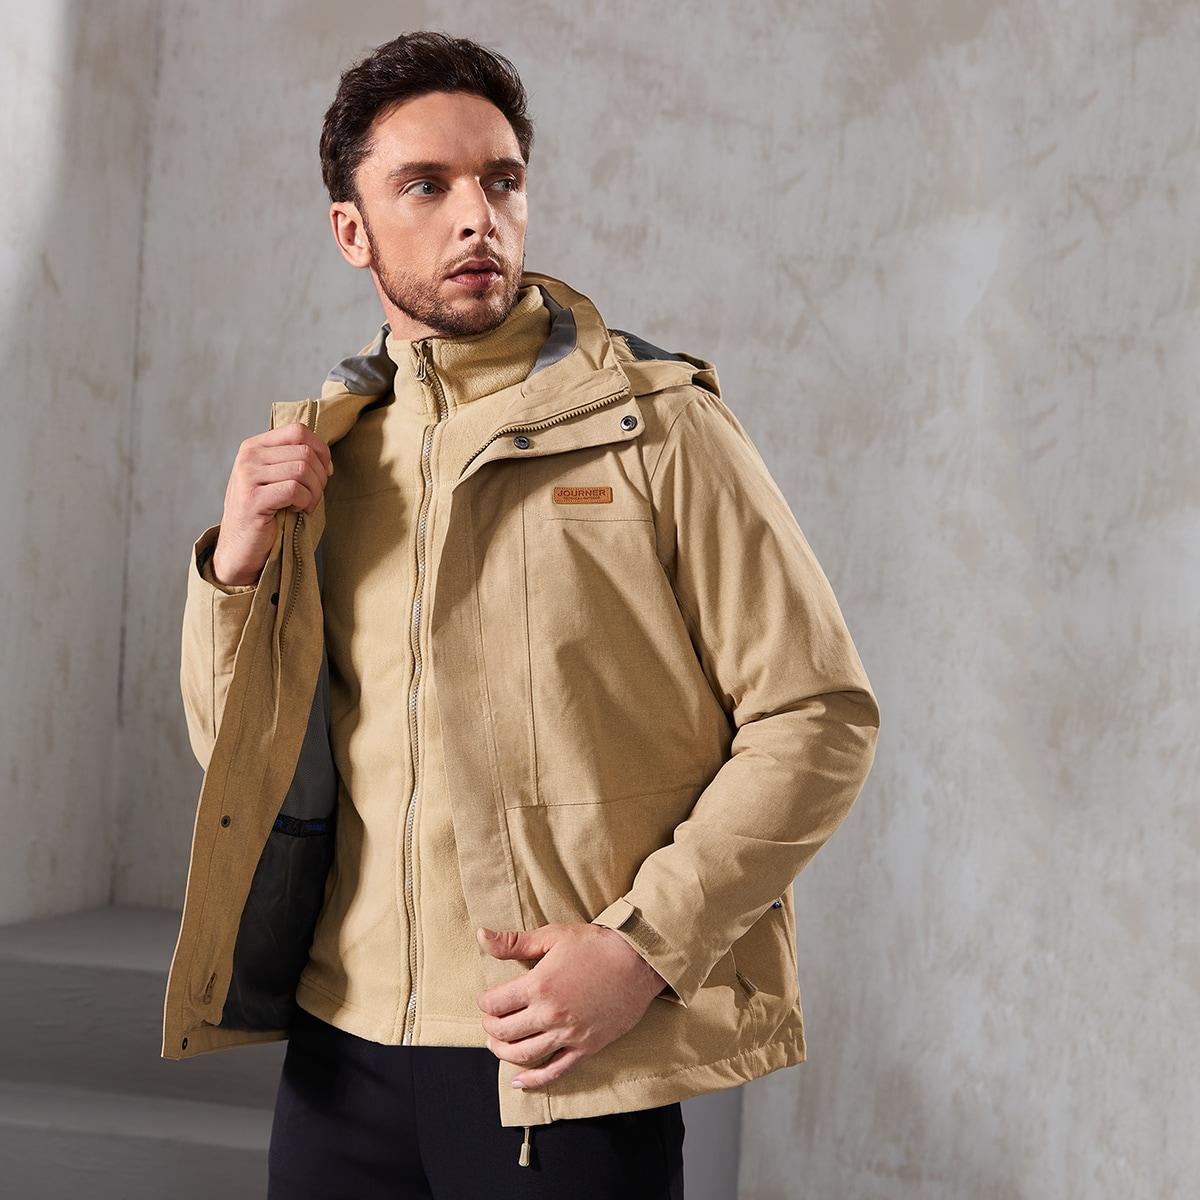 Sports Jacke mit abnehmbarem Vlies Futter und Kapuze